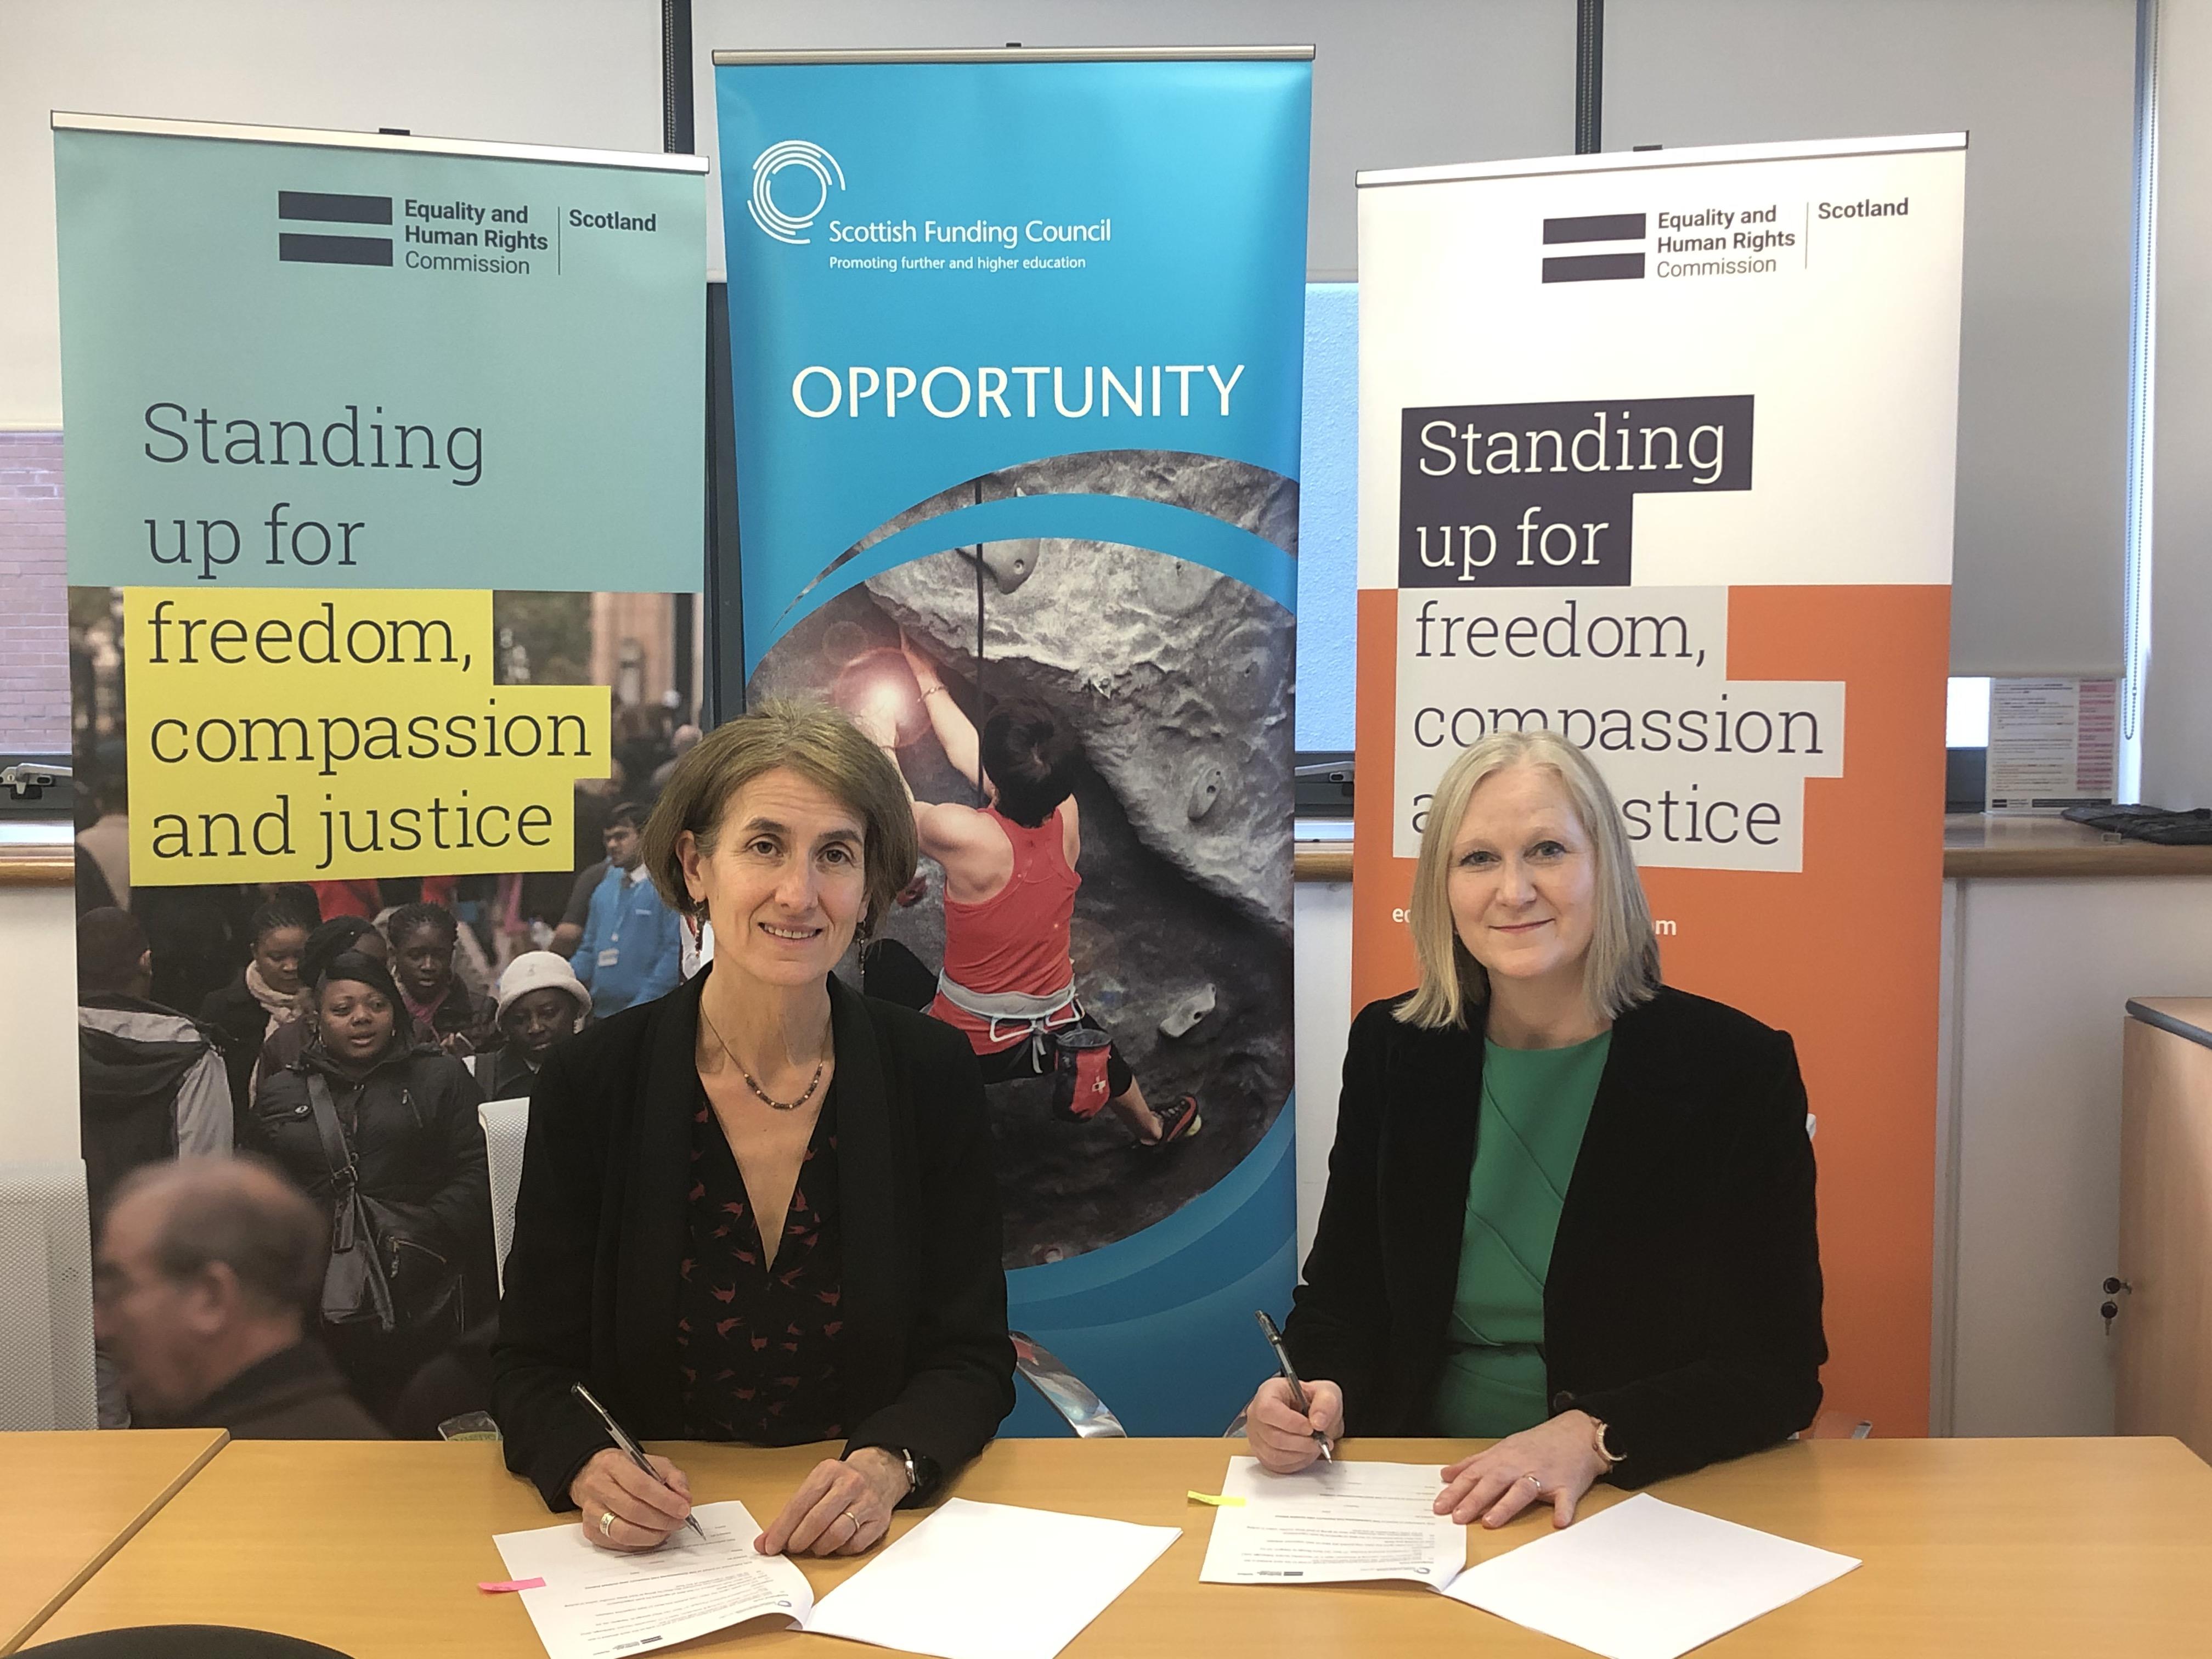 Rebecca Hilsenrath (left) and Karen Watt (right) sign the memorandum of understanding